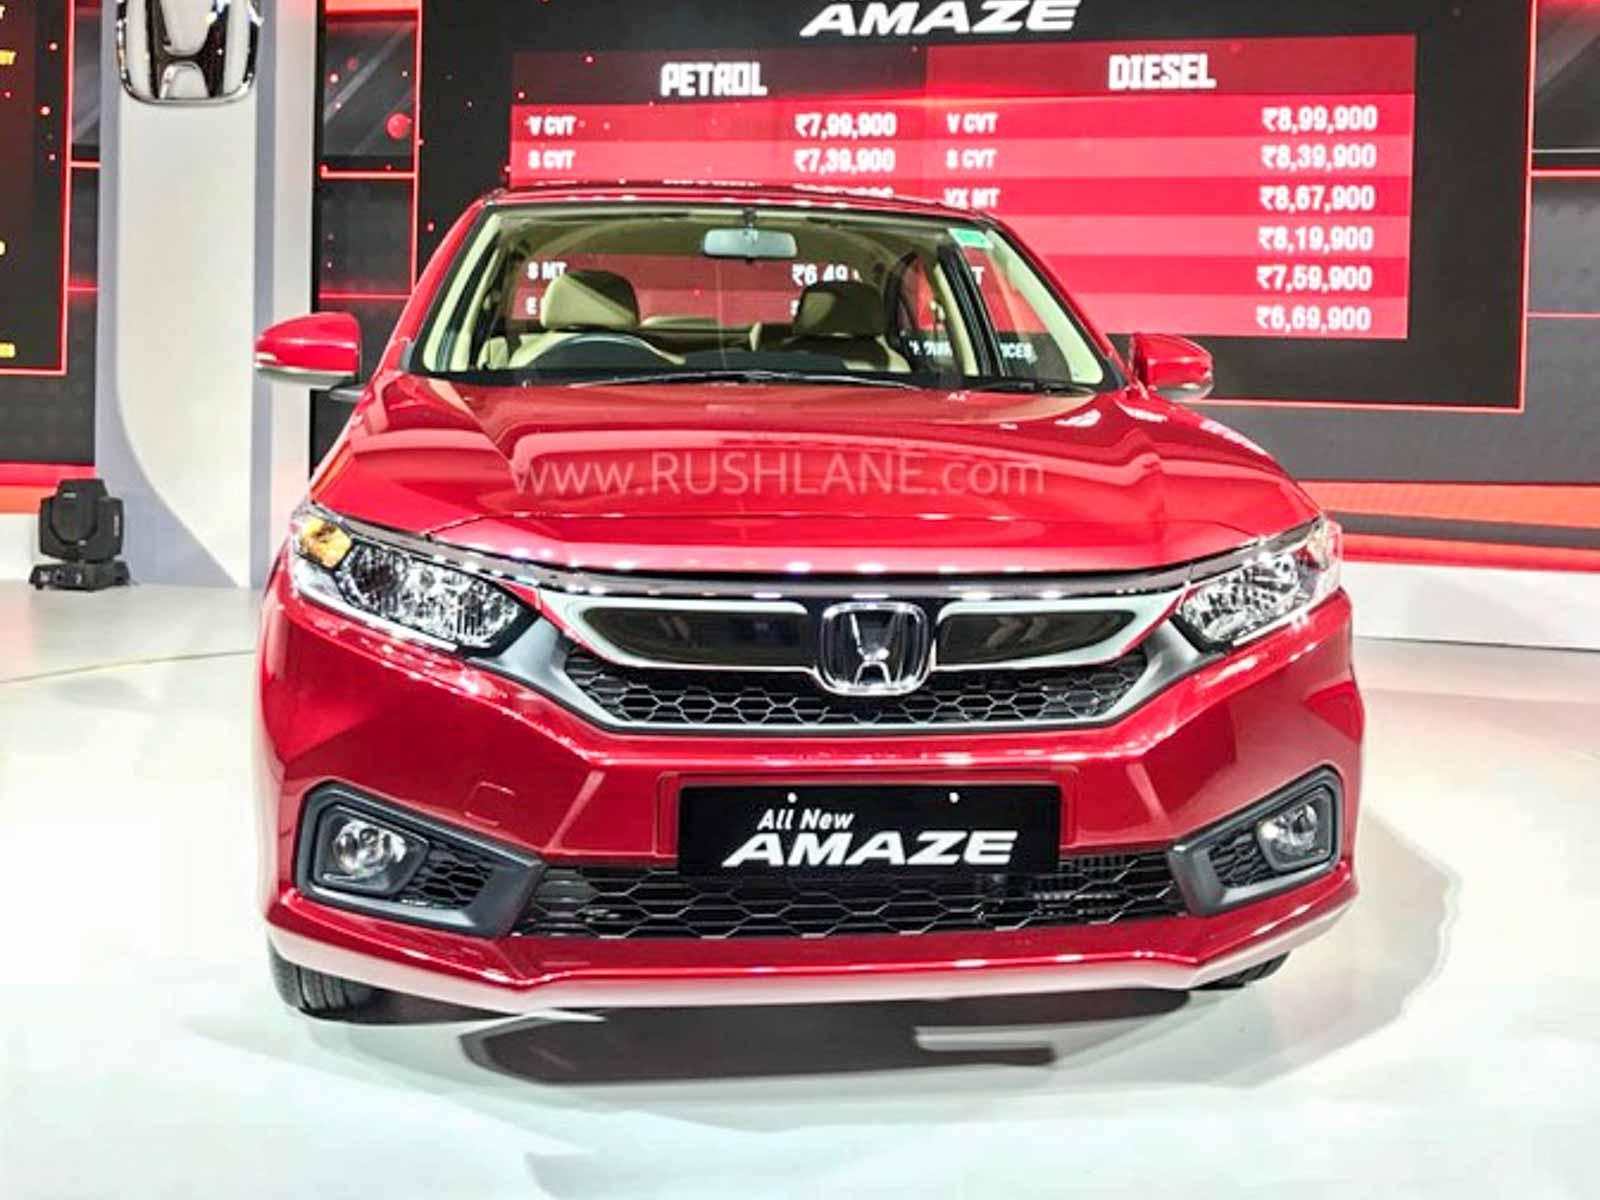 Honda Amaze car sales